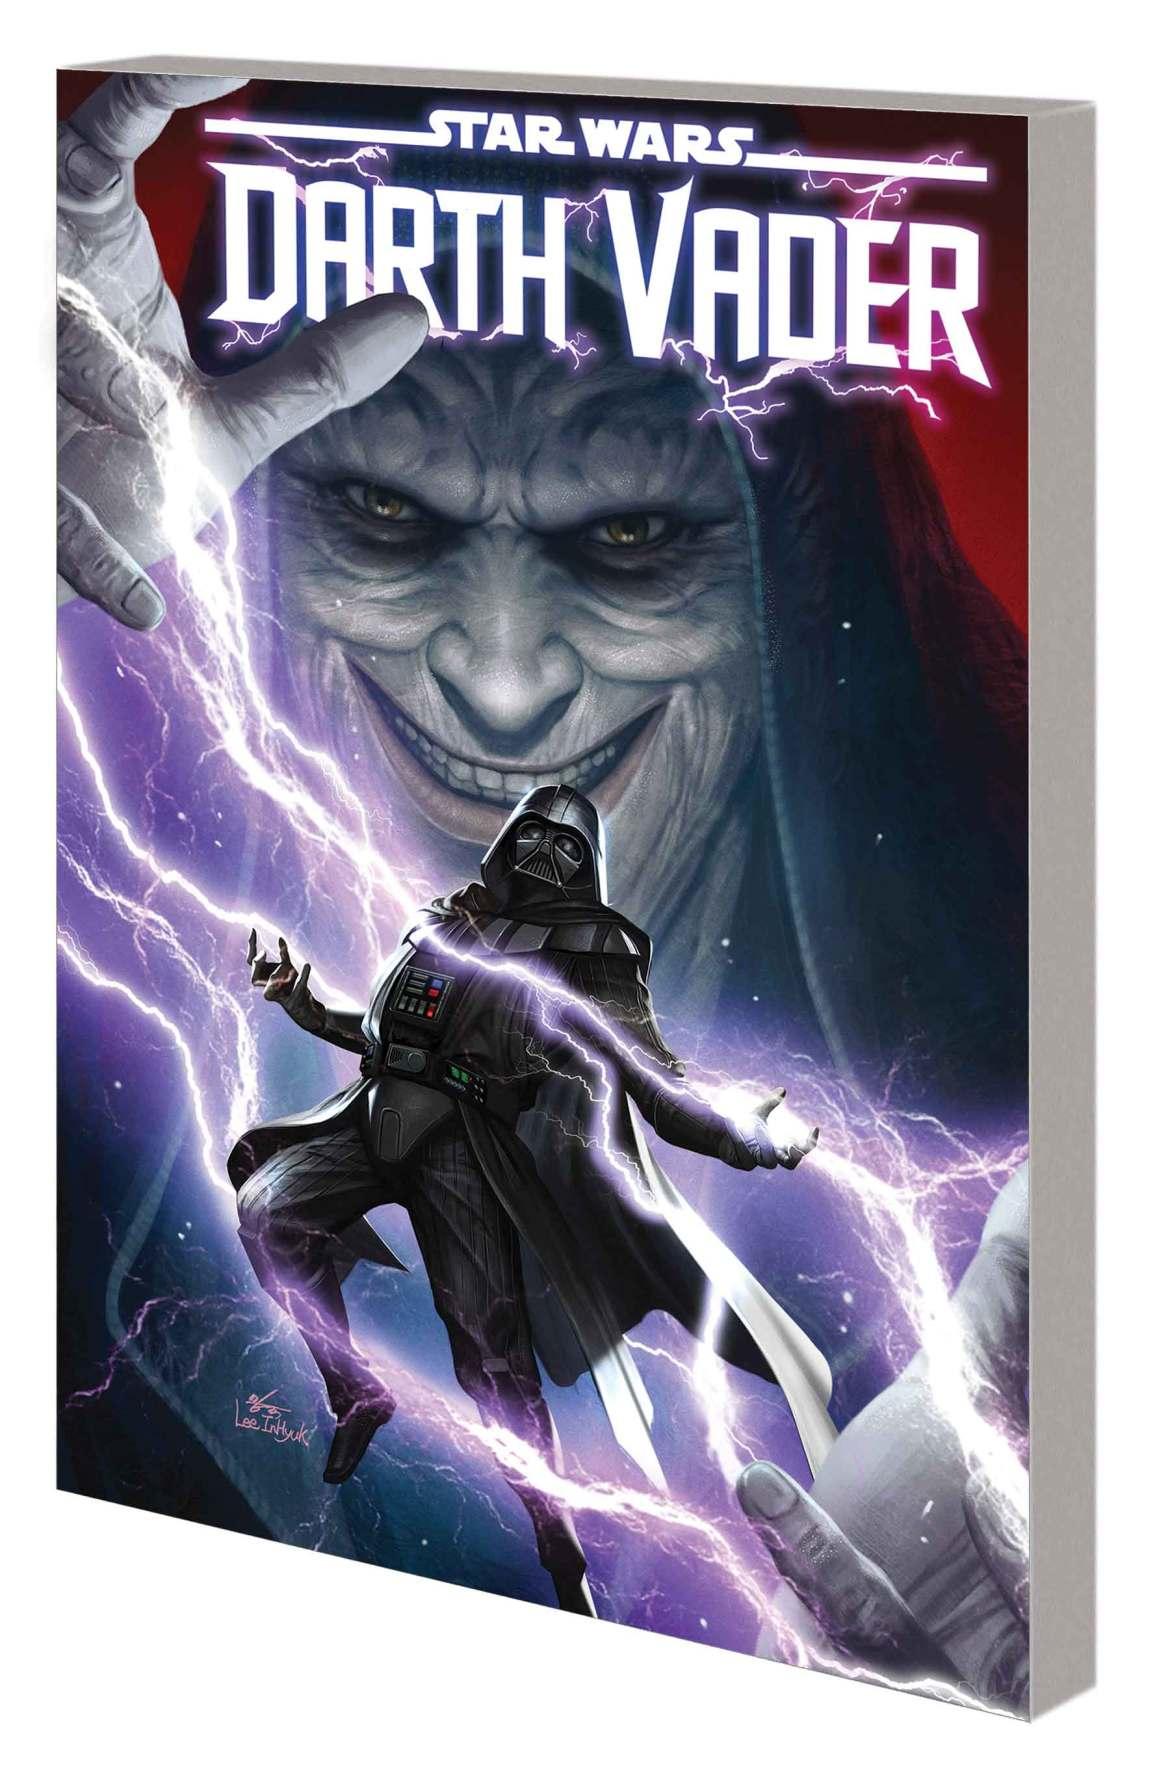 STWVADER_V2_TPB Marvel Comics May 2021 Solicitations